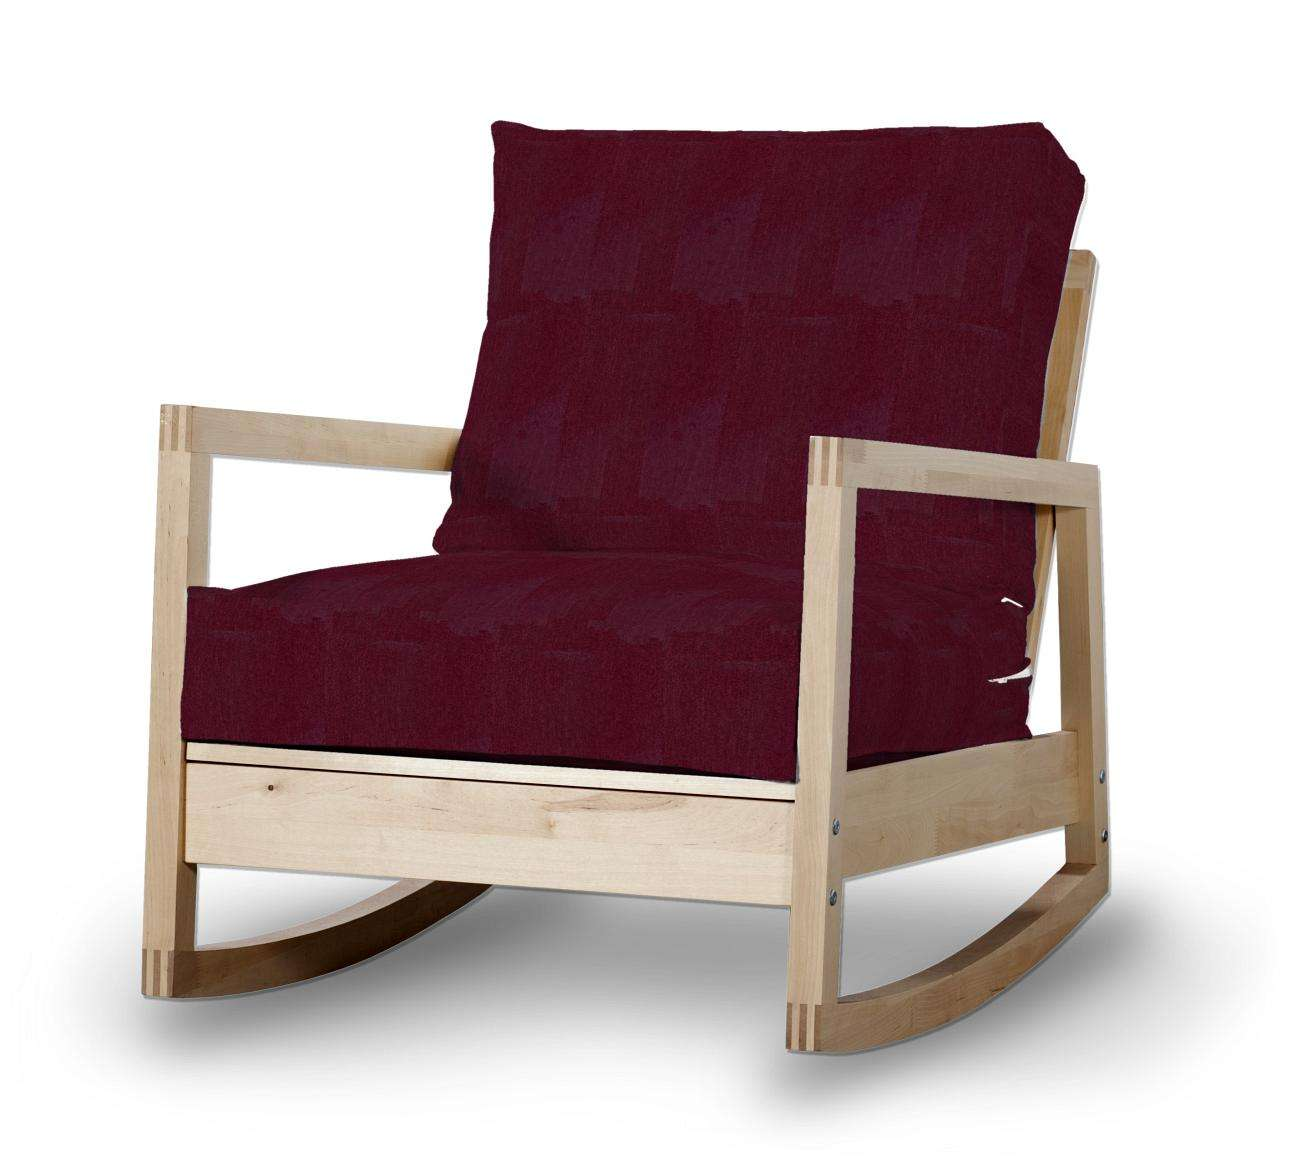 Lillberg Sesselbezug Sesselhusse, Modell Lillberg von der Kollektion Chenille , Stoff: 702-19